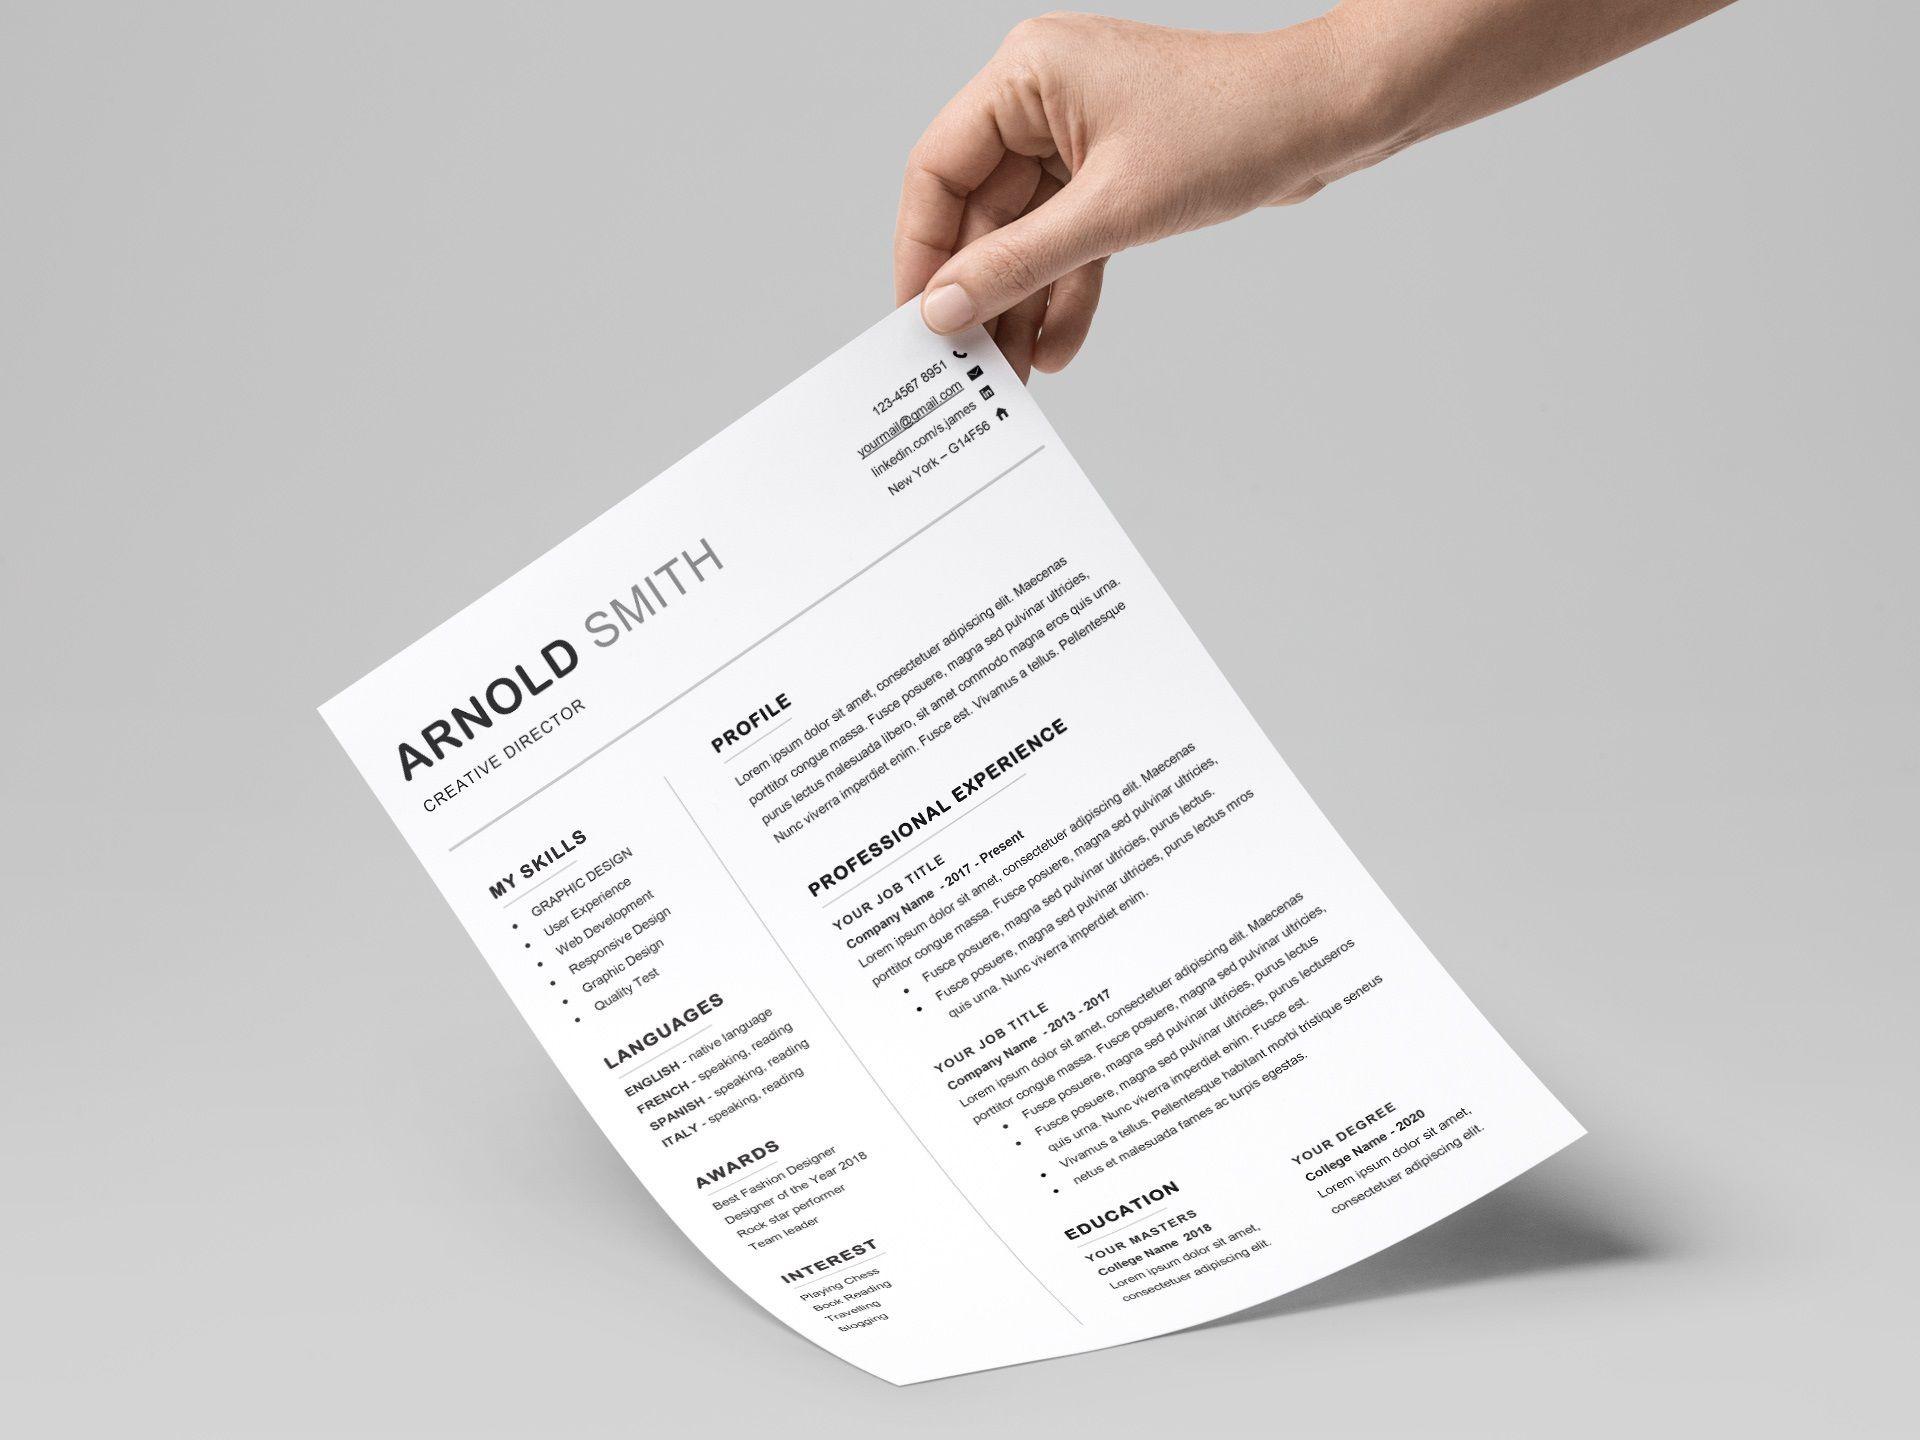 002 Imposing Word Layout Free Download Inspiration  Template Magazine Bangla Keyboard1920